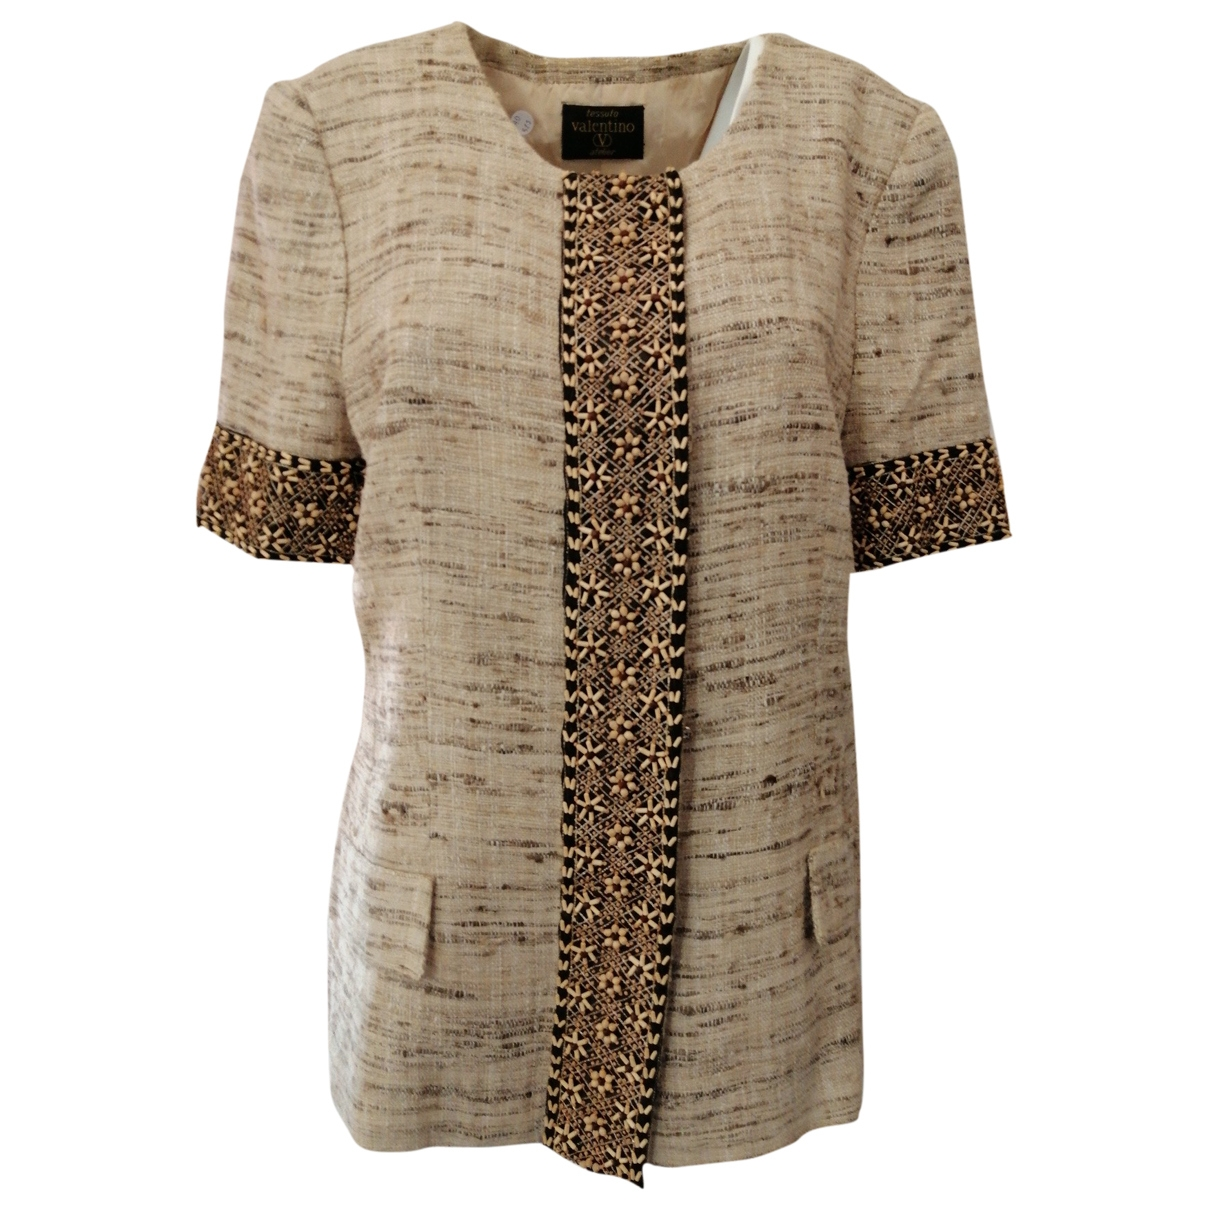 Valentino Garavani \N Beige Wool jacket for Women L International